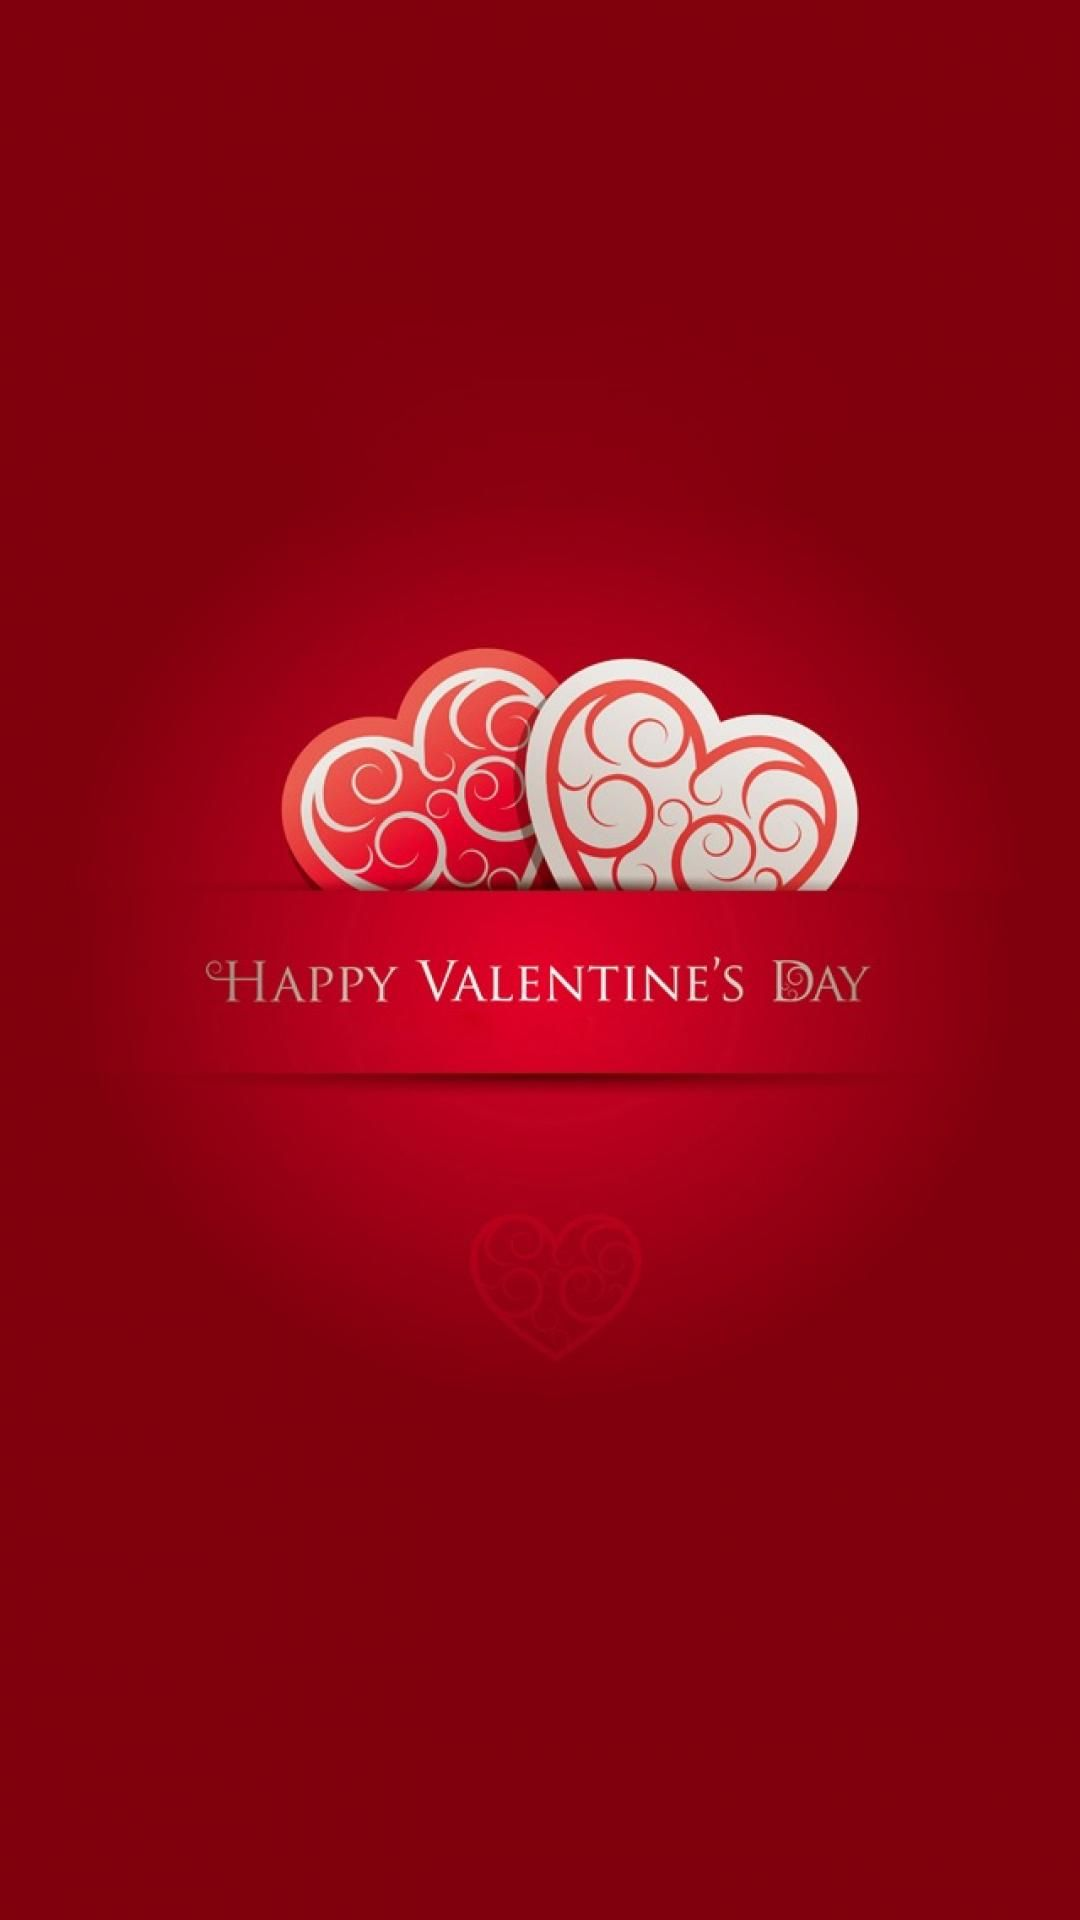 Iphone 6 Retina Wallpaper Valentines Wallpaper Iphone